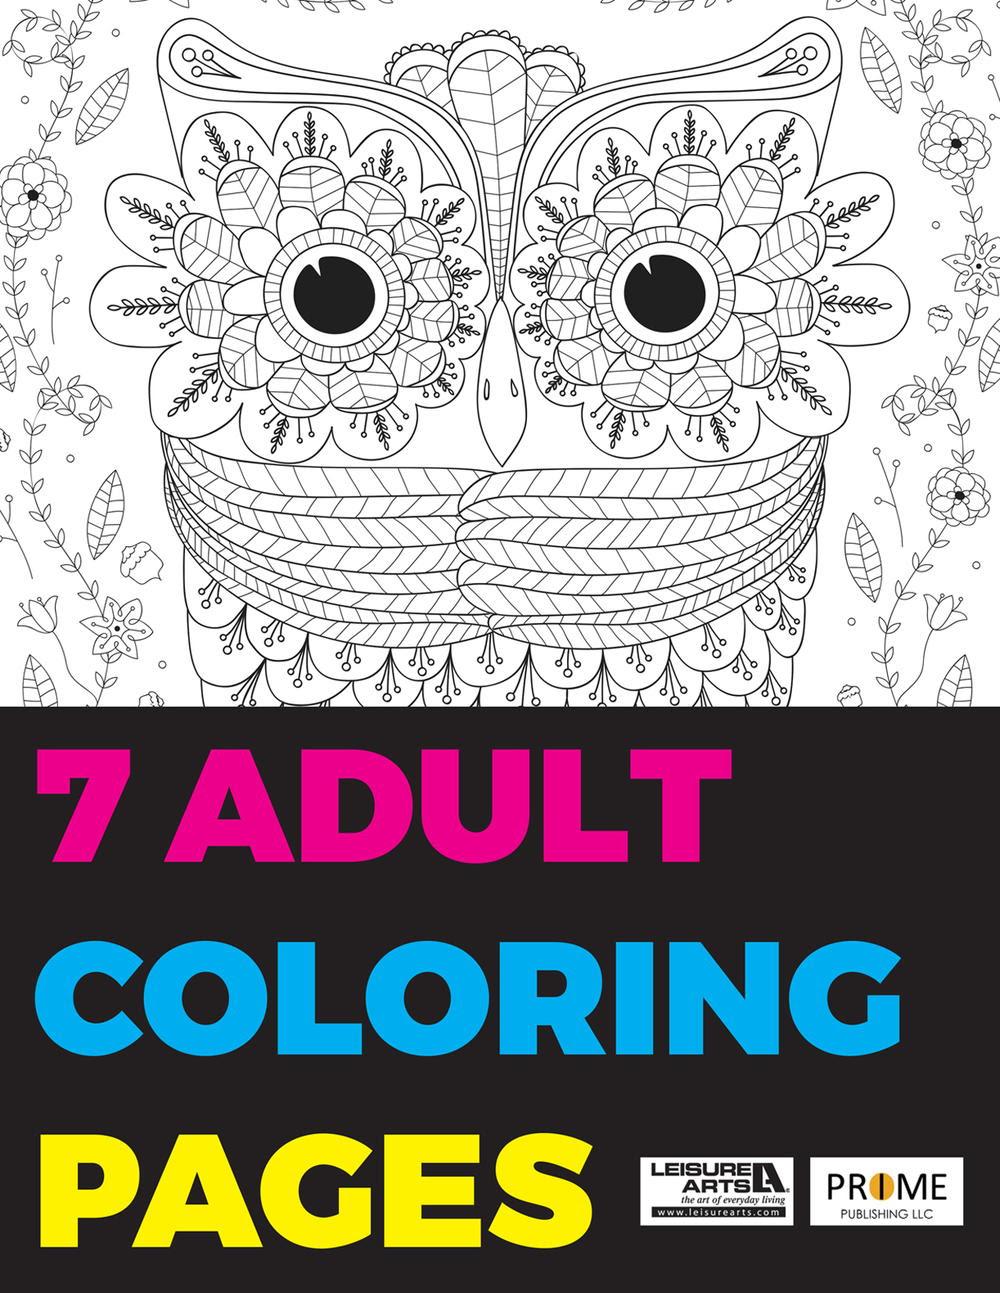 7 Adult Coloring Pages free eBook | FaveCrafts.com